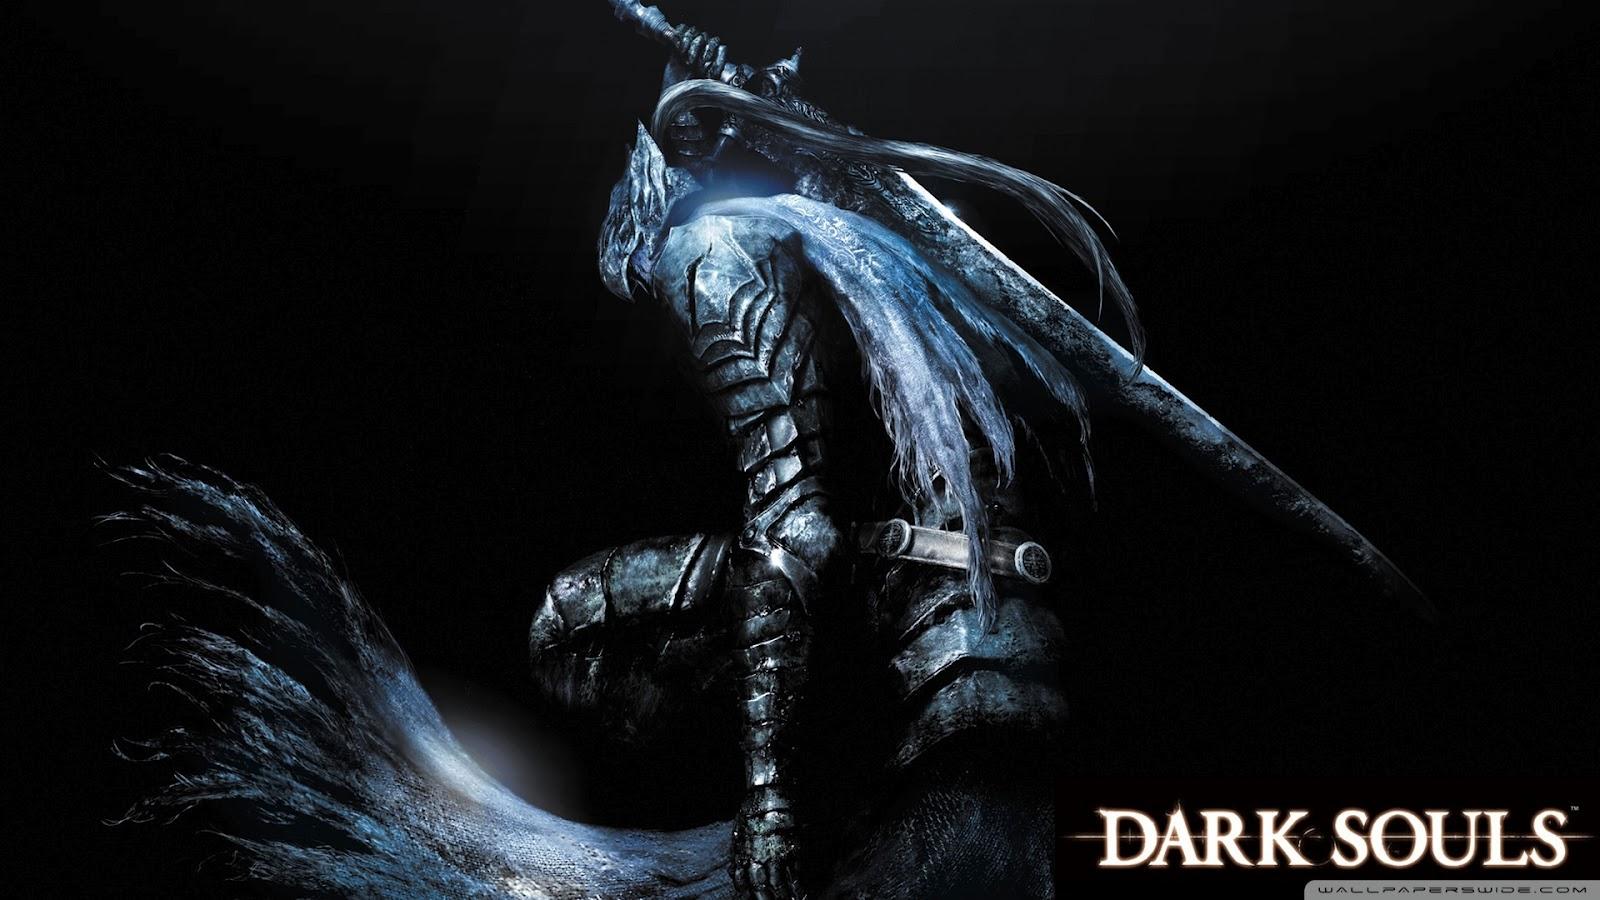 Dark Souls 2 Wallpaper: The Best I Got !: Best Game Wallpapers